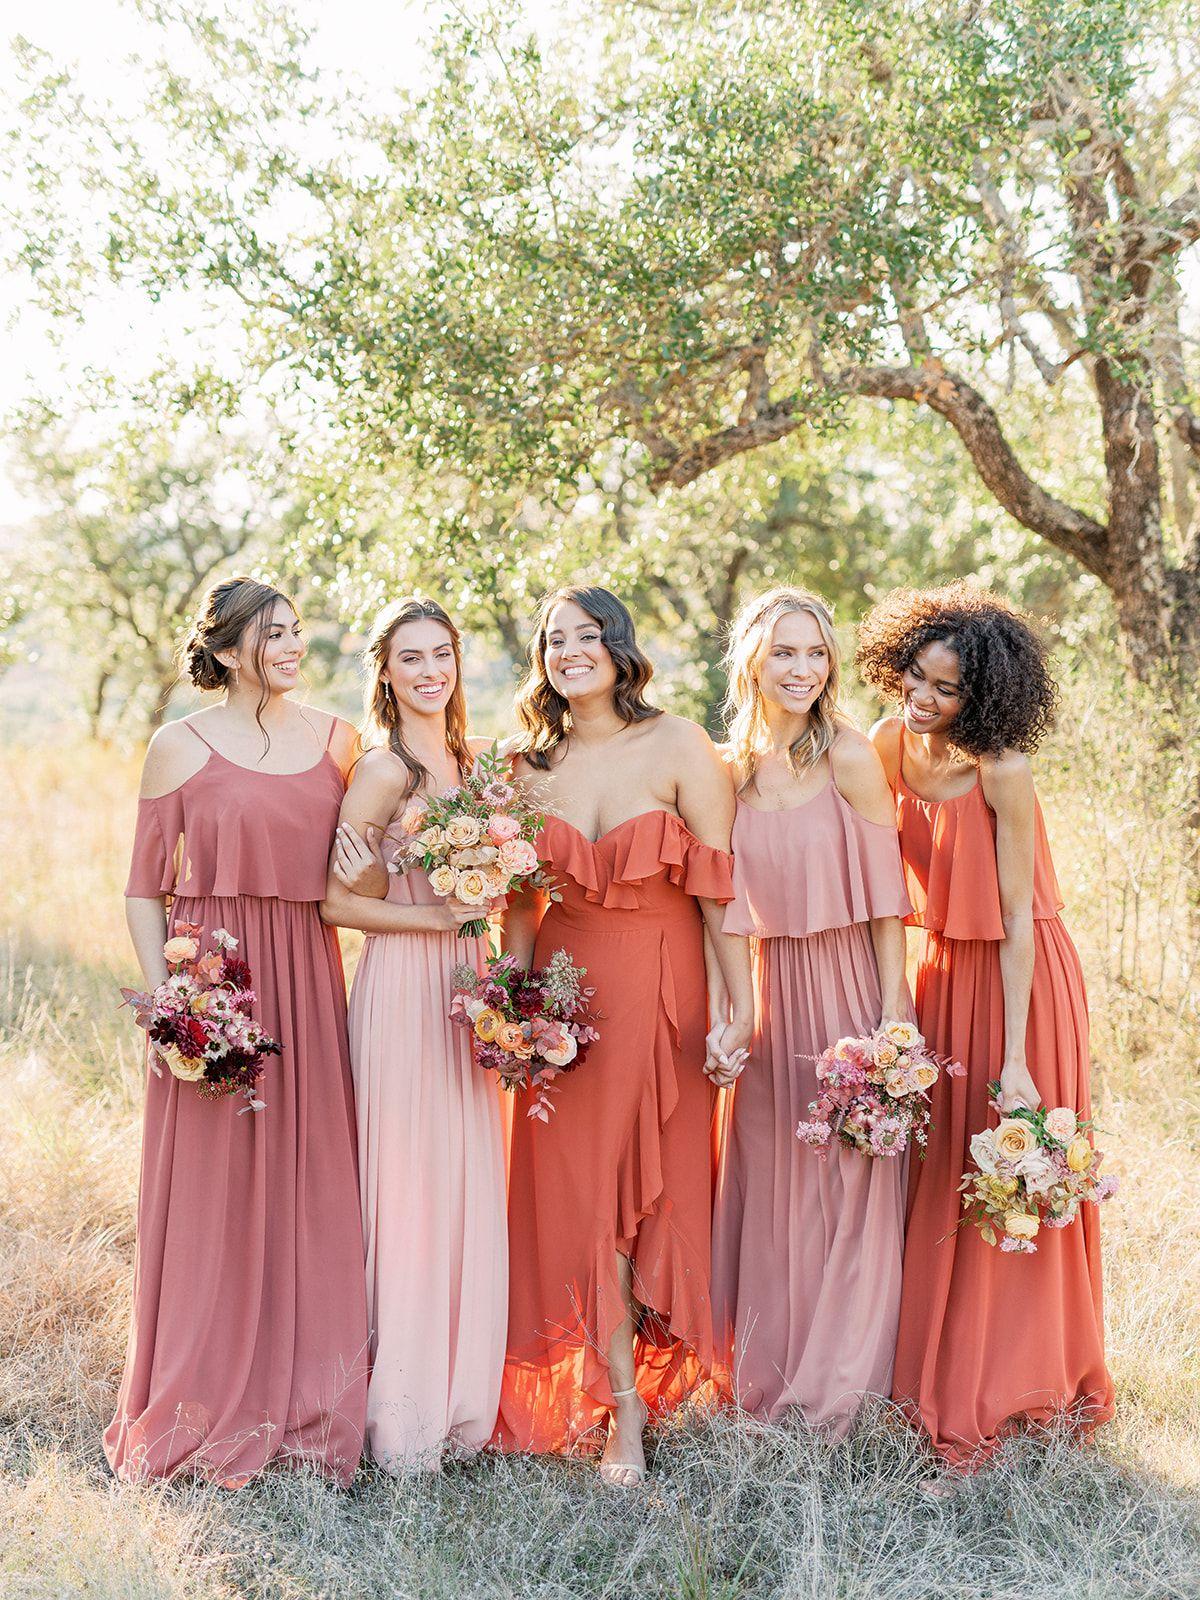 Boho Bridesmaid Dresses Bridesmaid Dresses Boho Blush Groomsmen Attire Rose Bridesmaid Dresses [ 1600 x 1200 Pixel ]